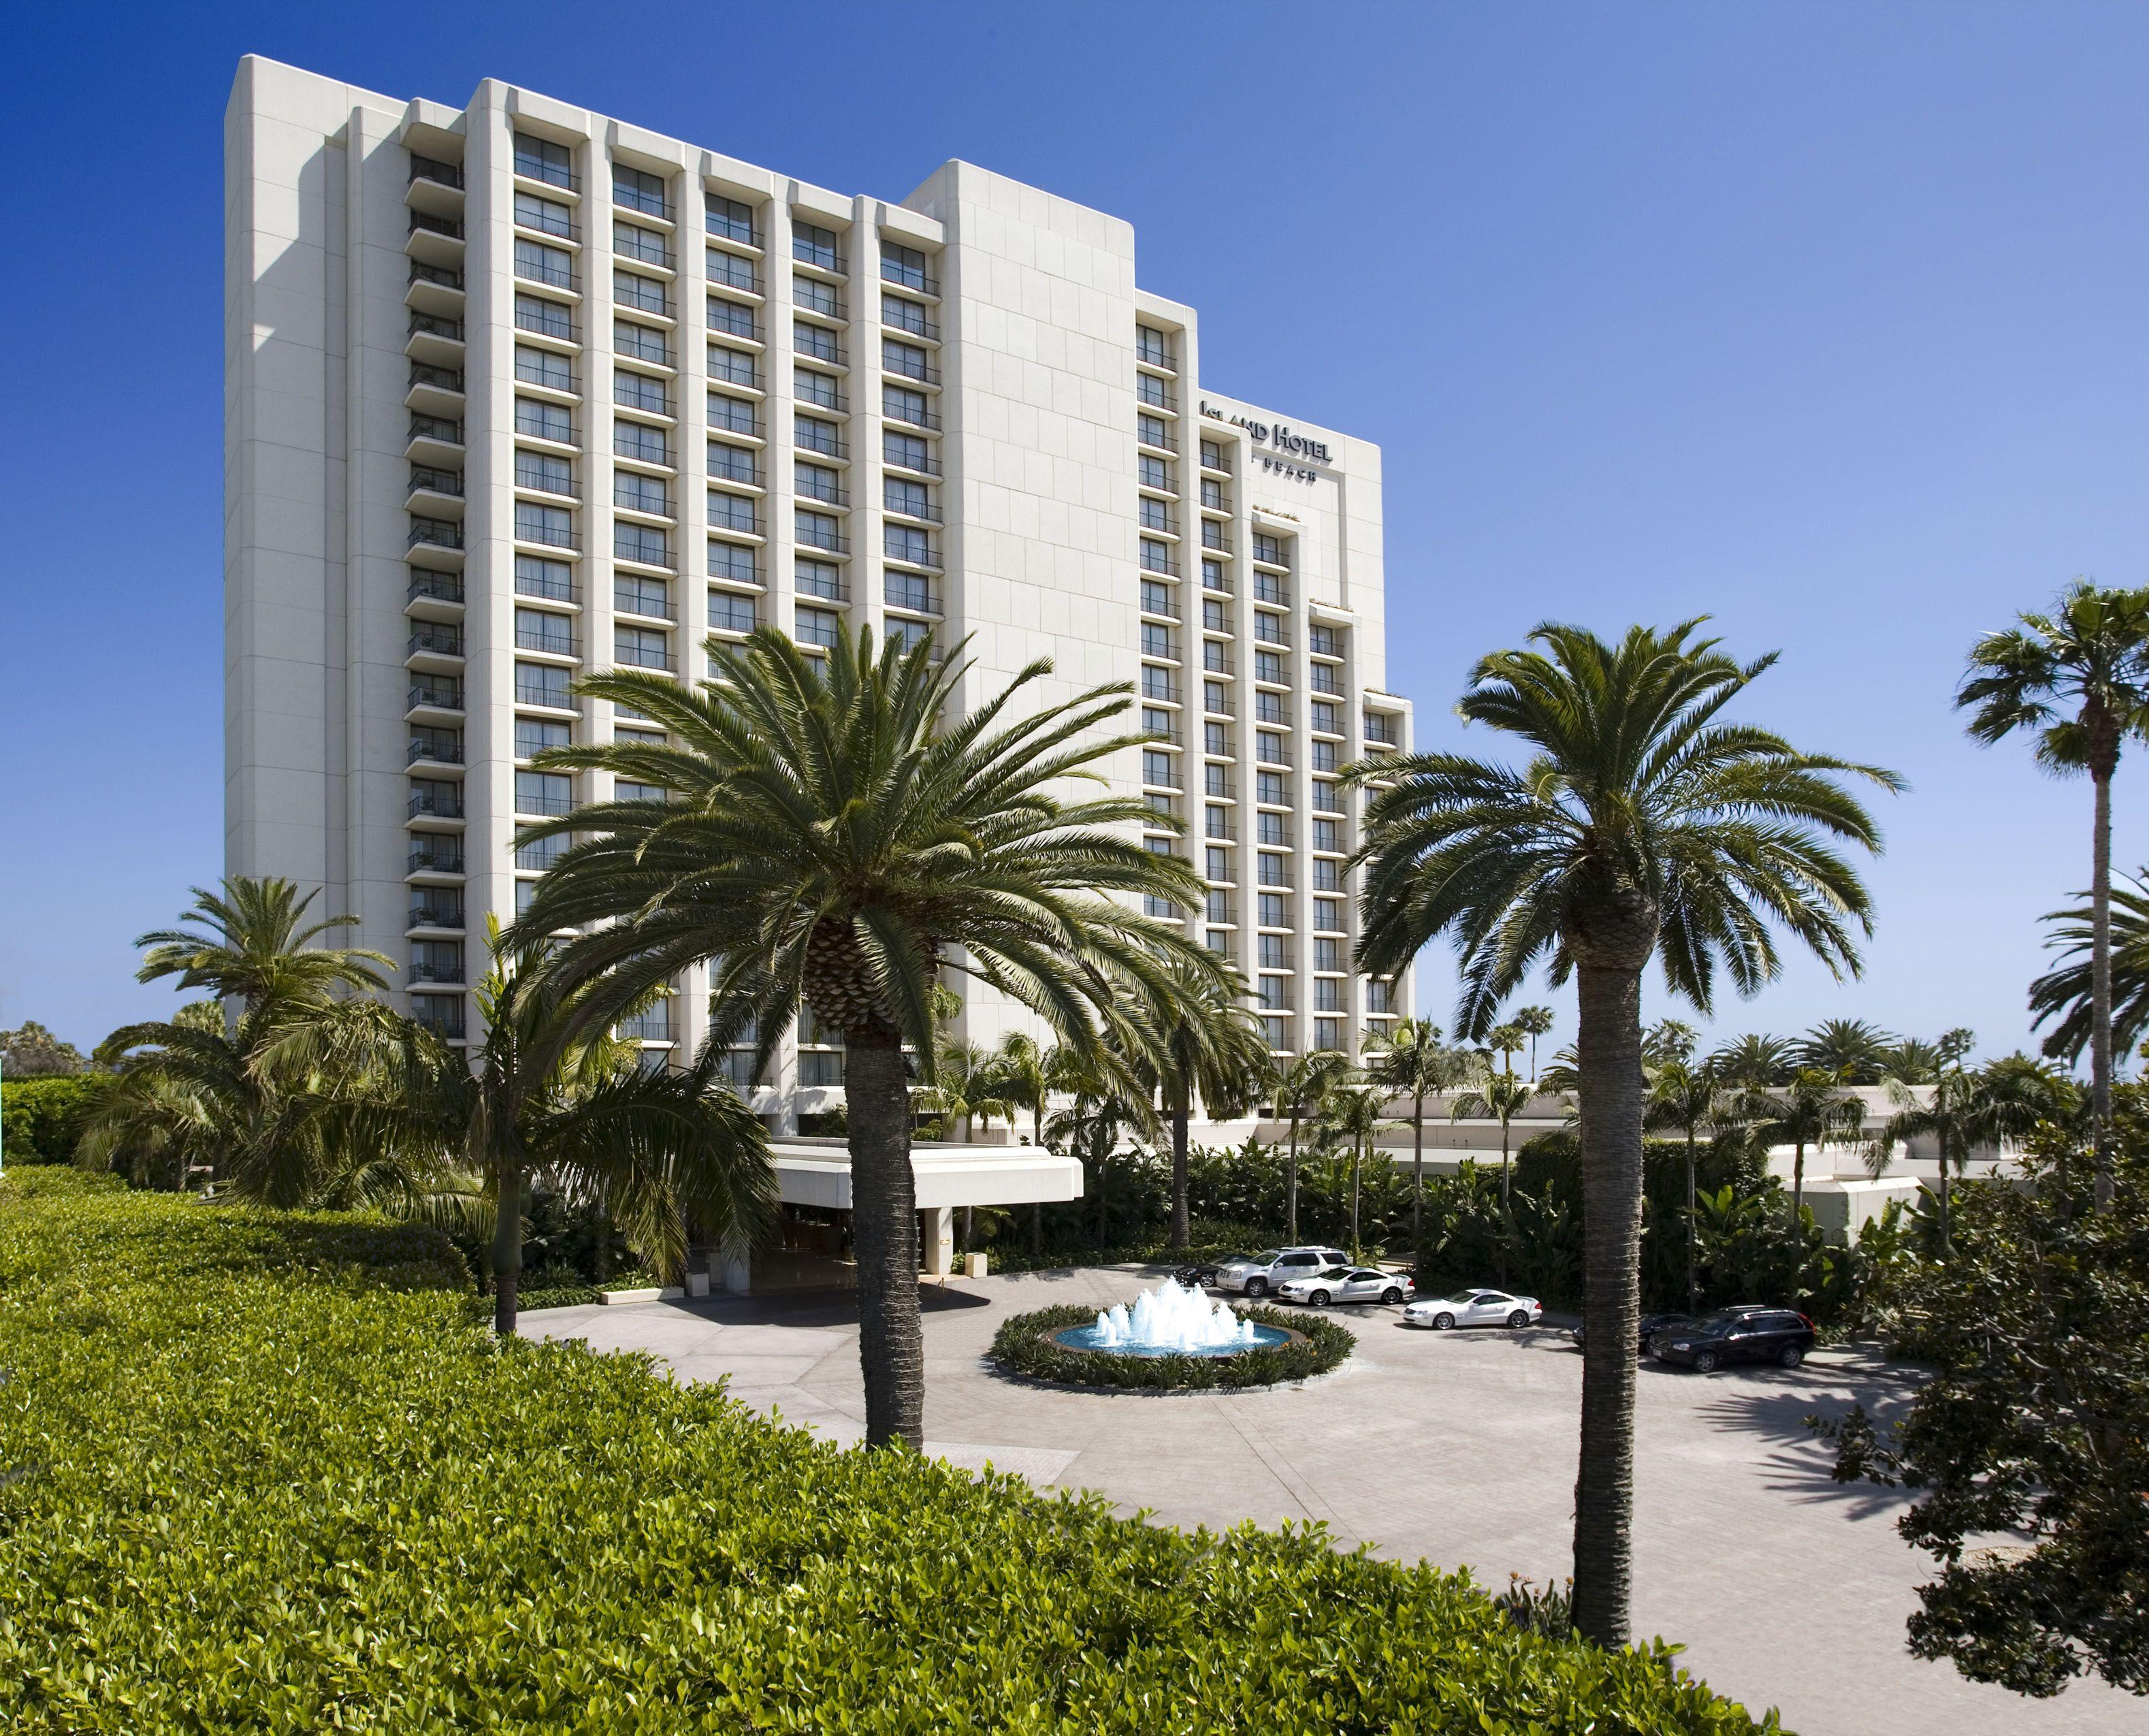 Island Hotel Newport Beach Ca